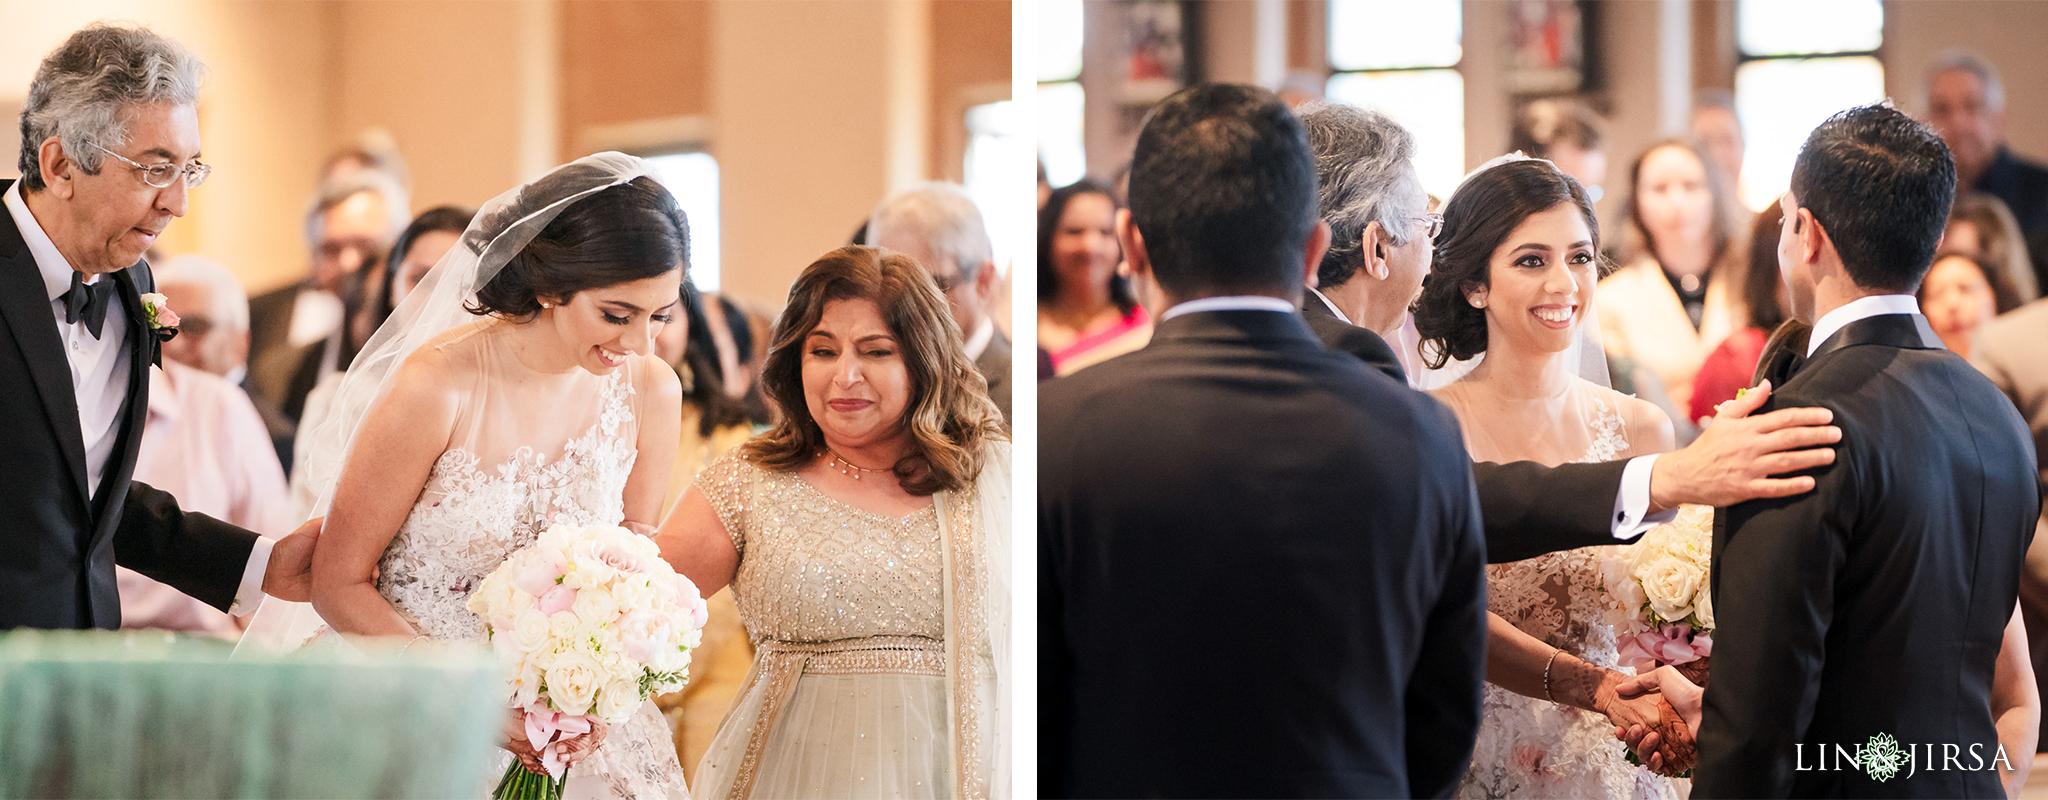 11 Newport Beach Marriott Indian Wedding Photography 1